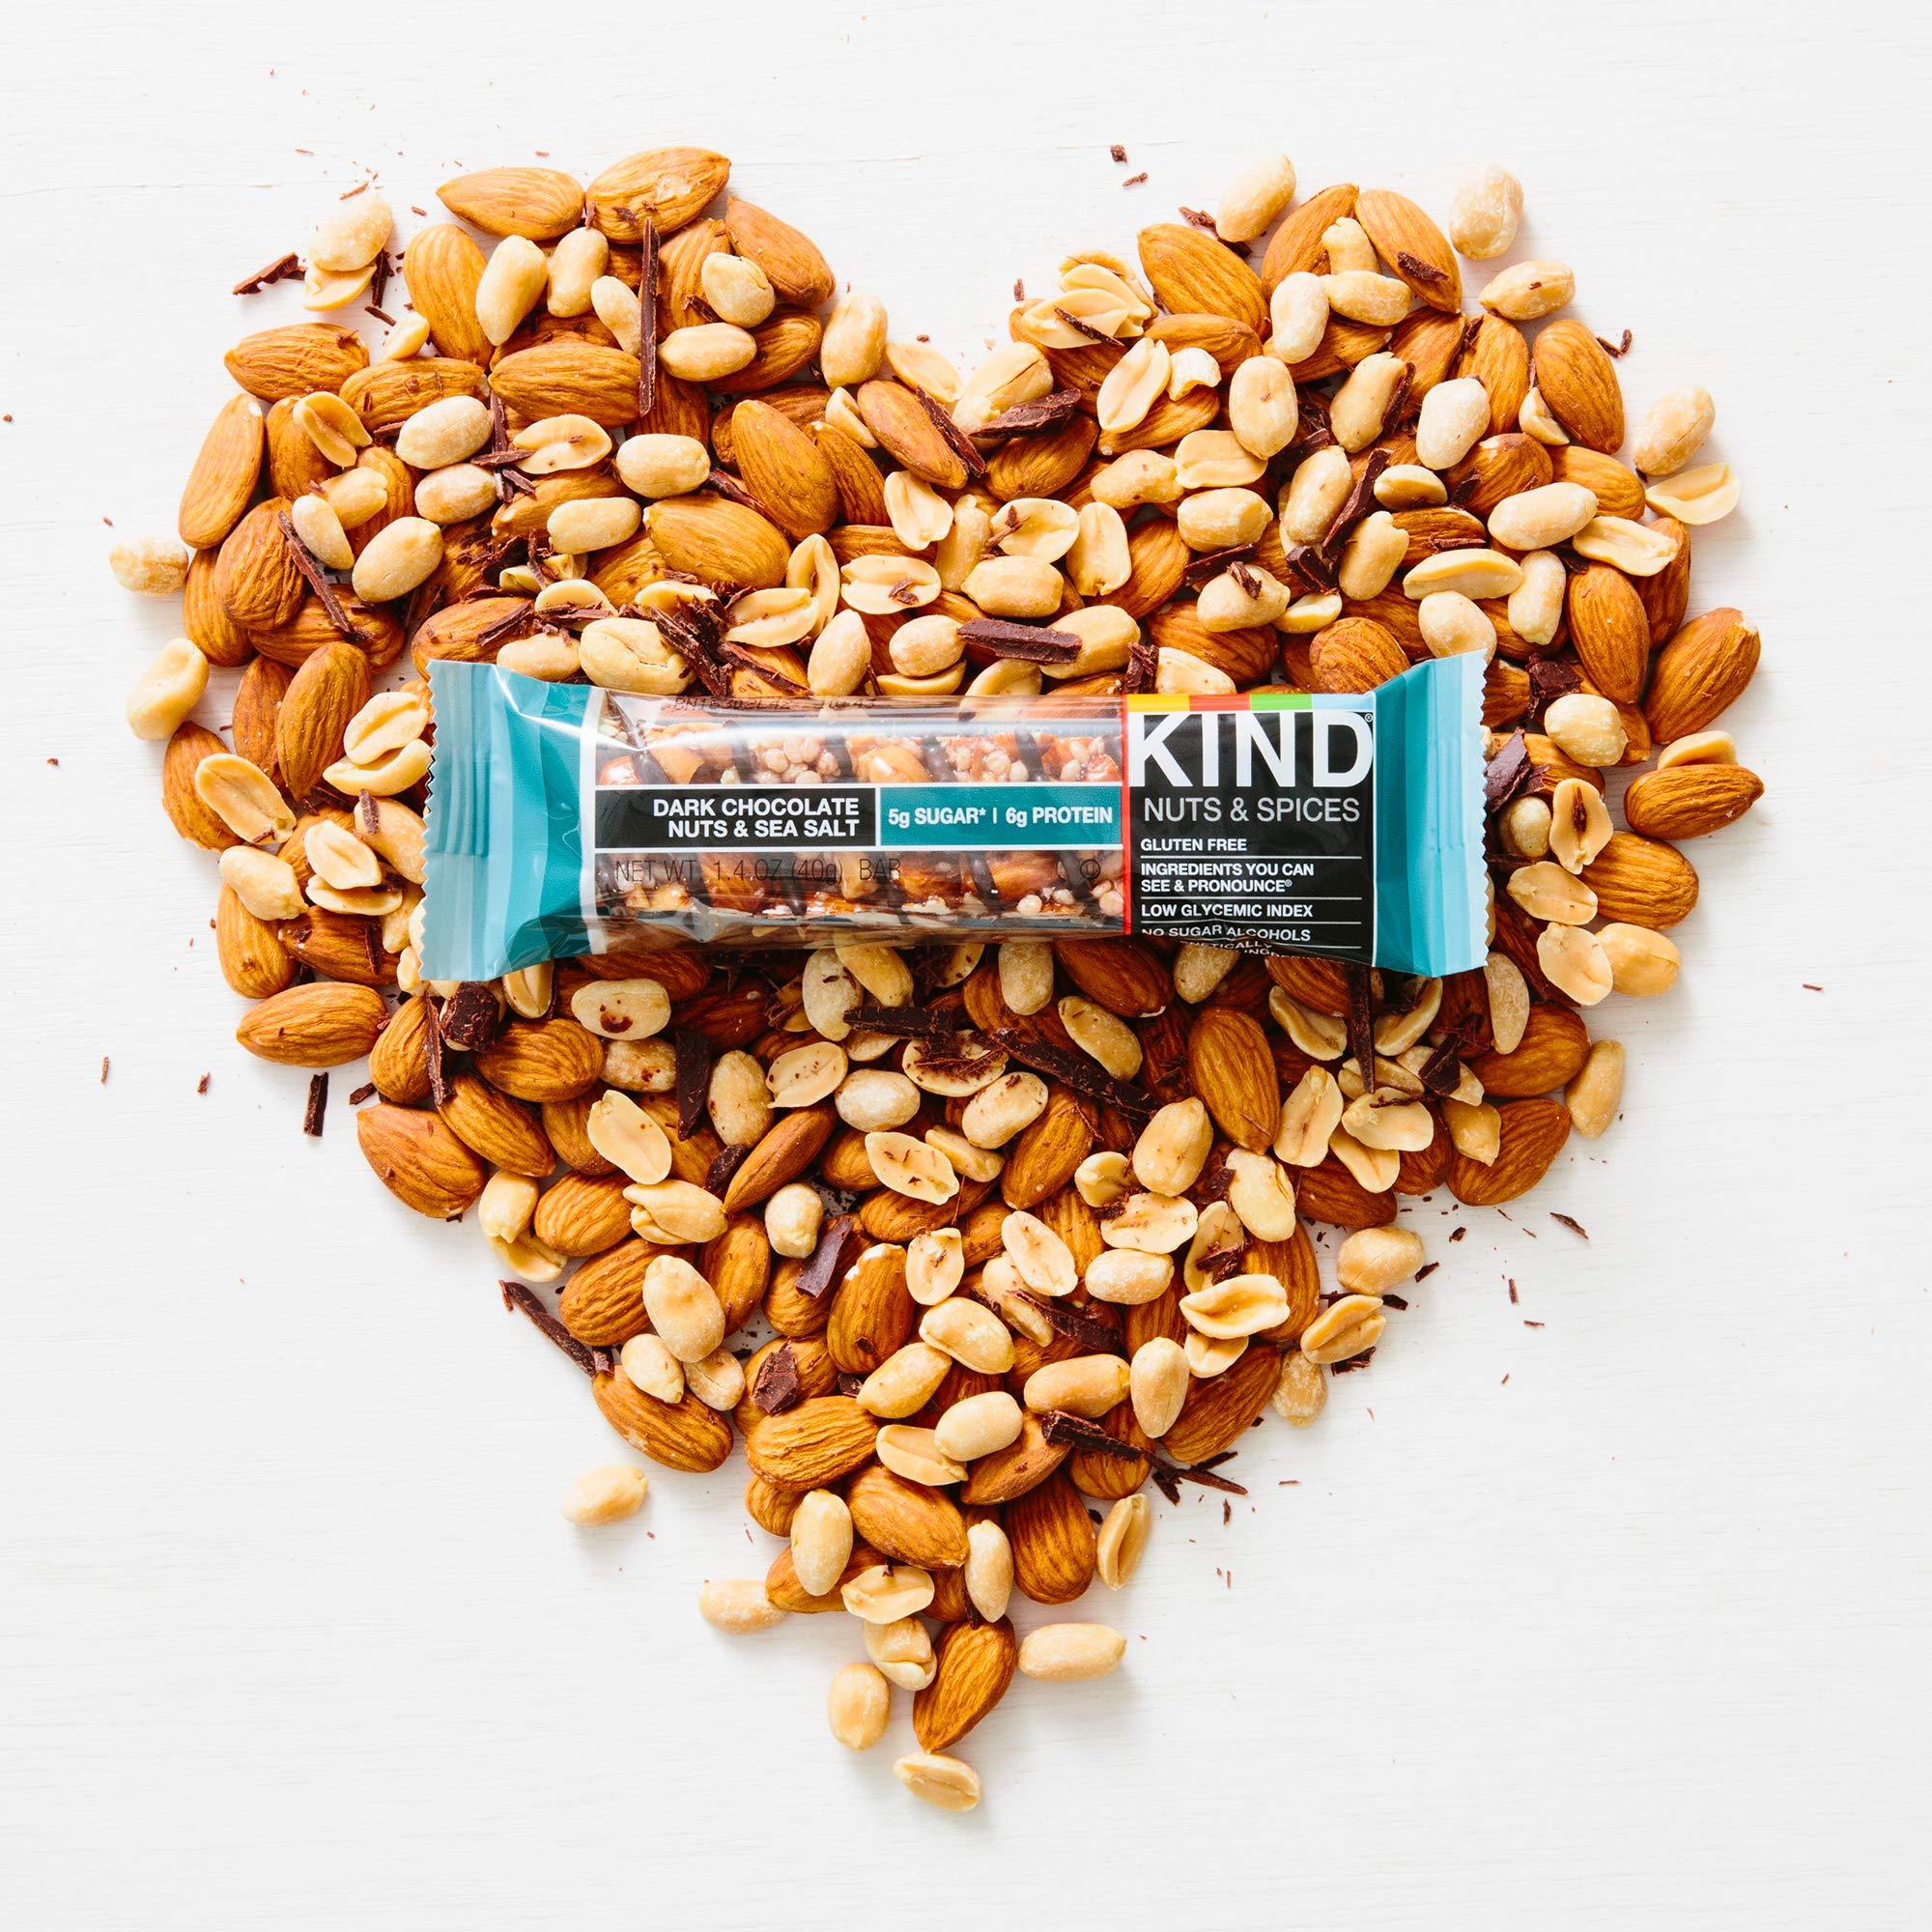 KIND Bars, Dark Chocolate Nuts & Sea Salt, Gluten Free, Low Sugar, 1.4oz, 48 Count by KIND (Image #6)